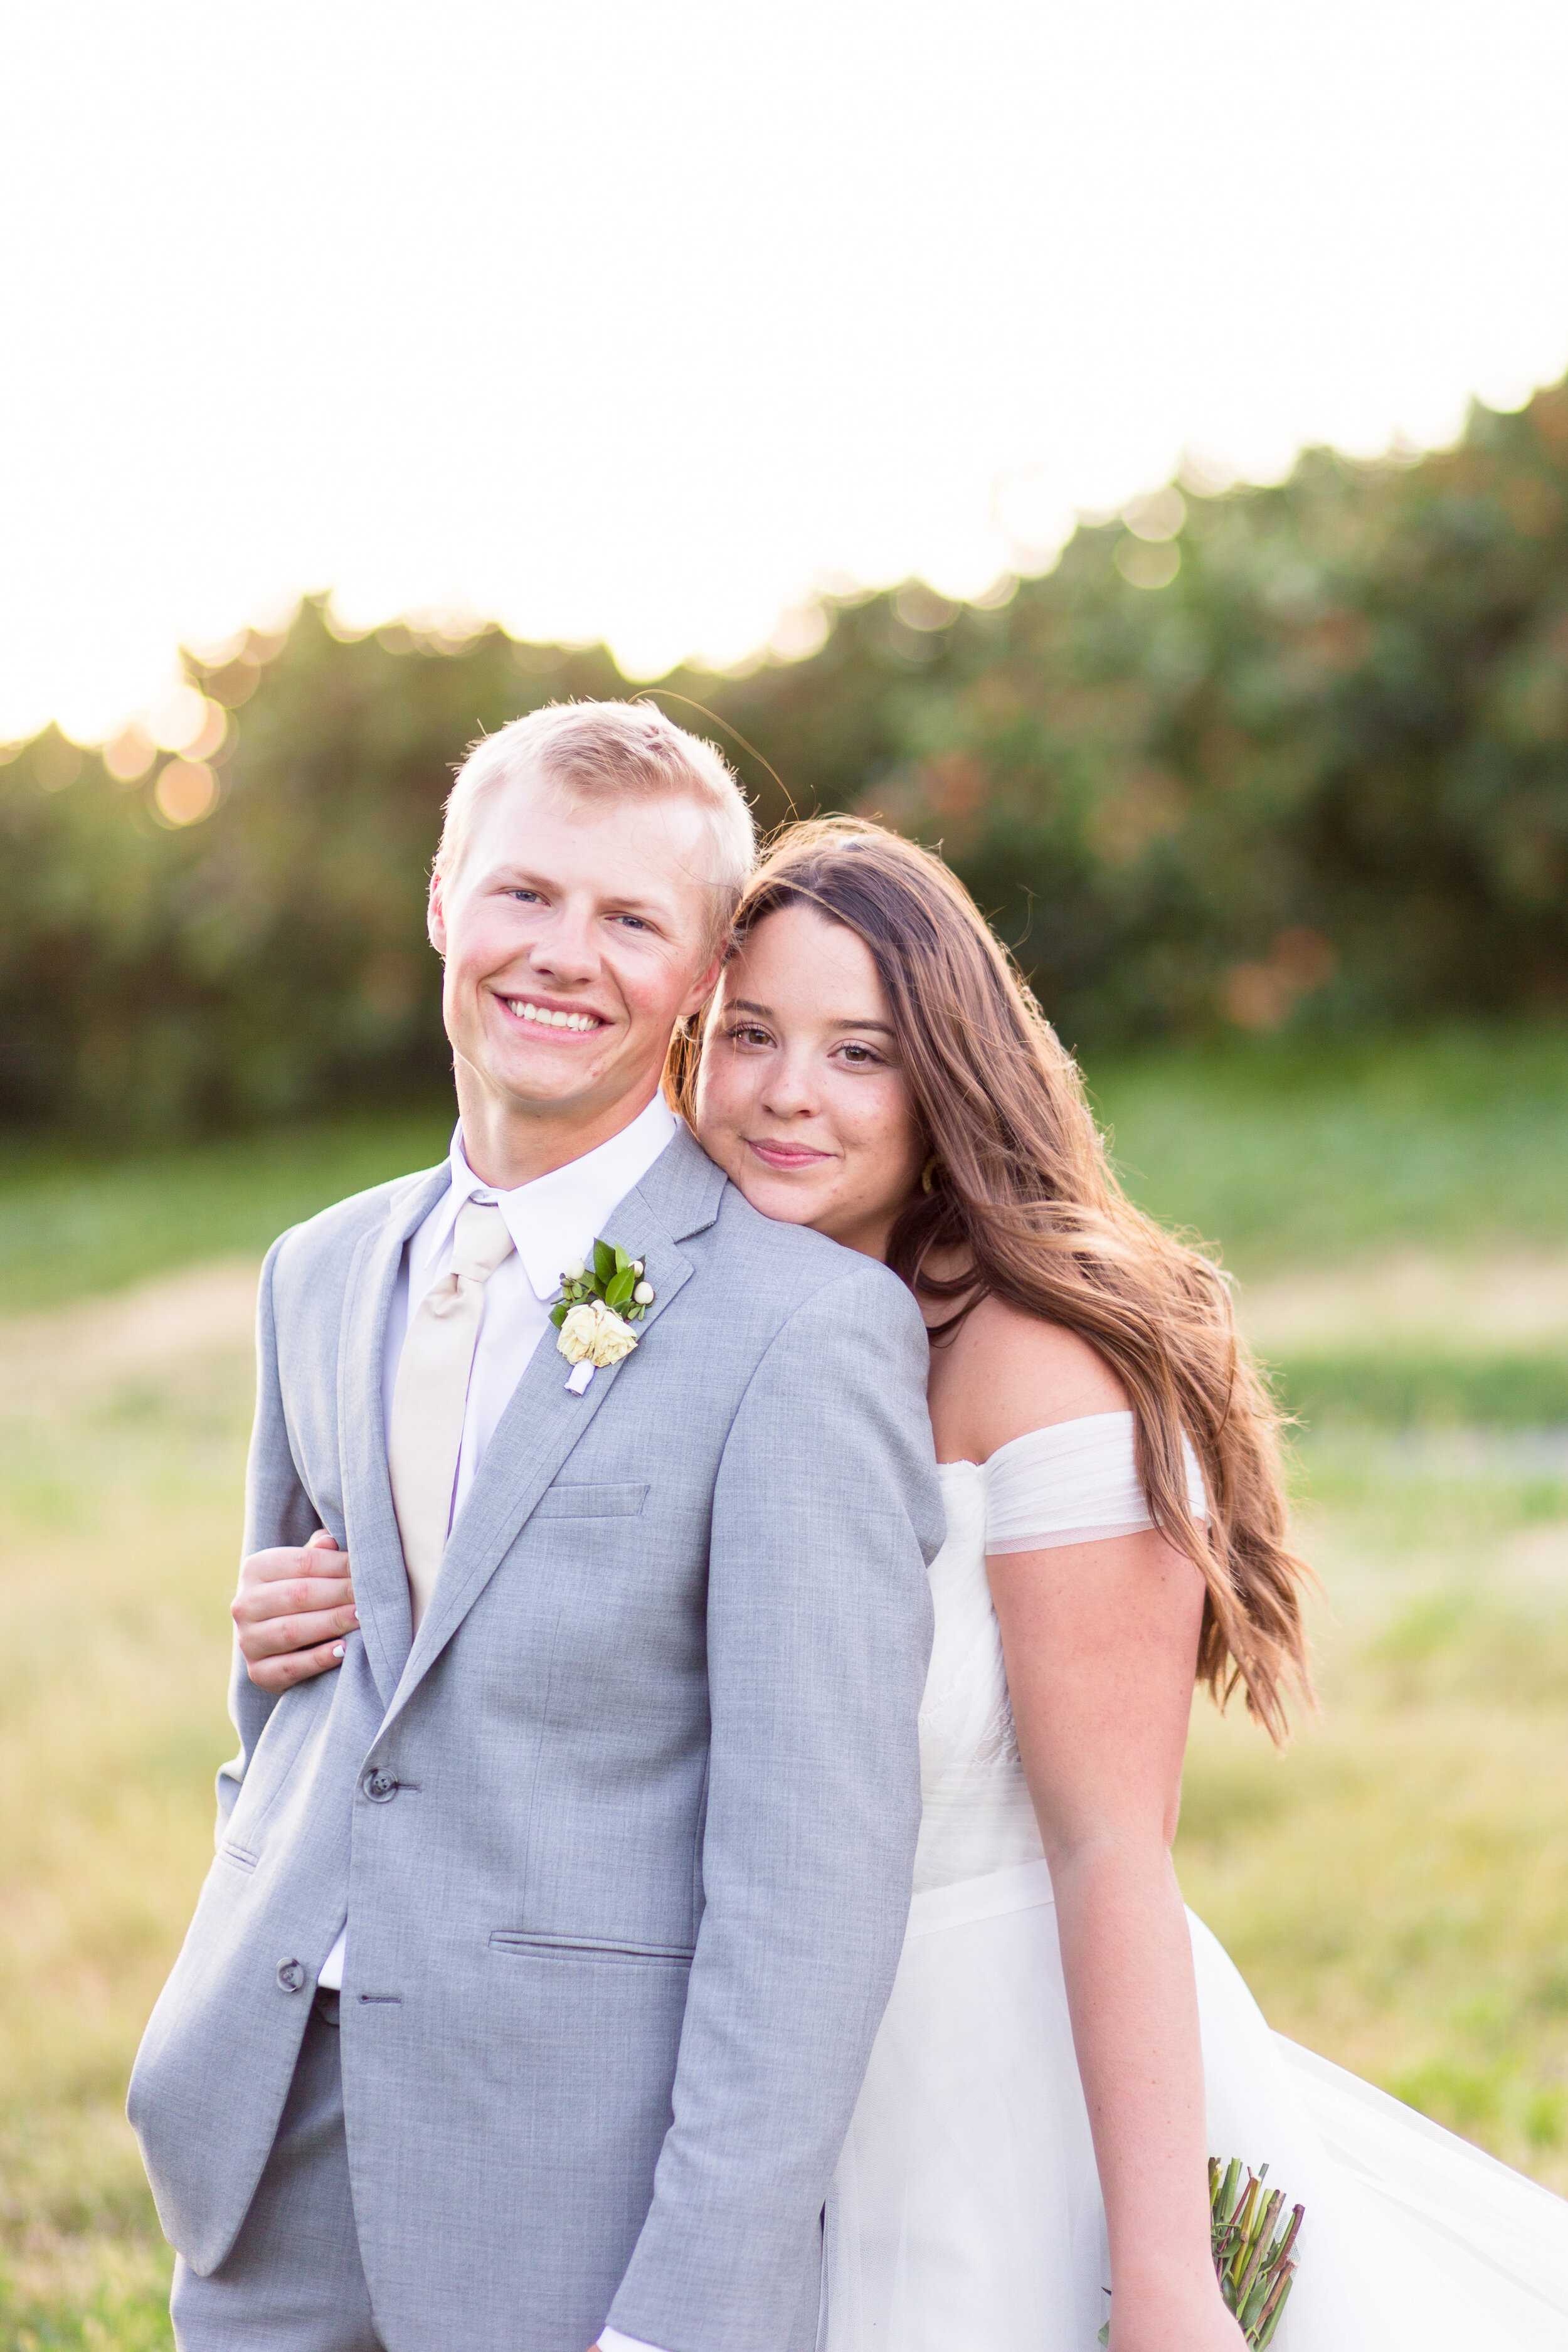 spokane bride and groom before ceremony